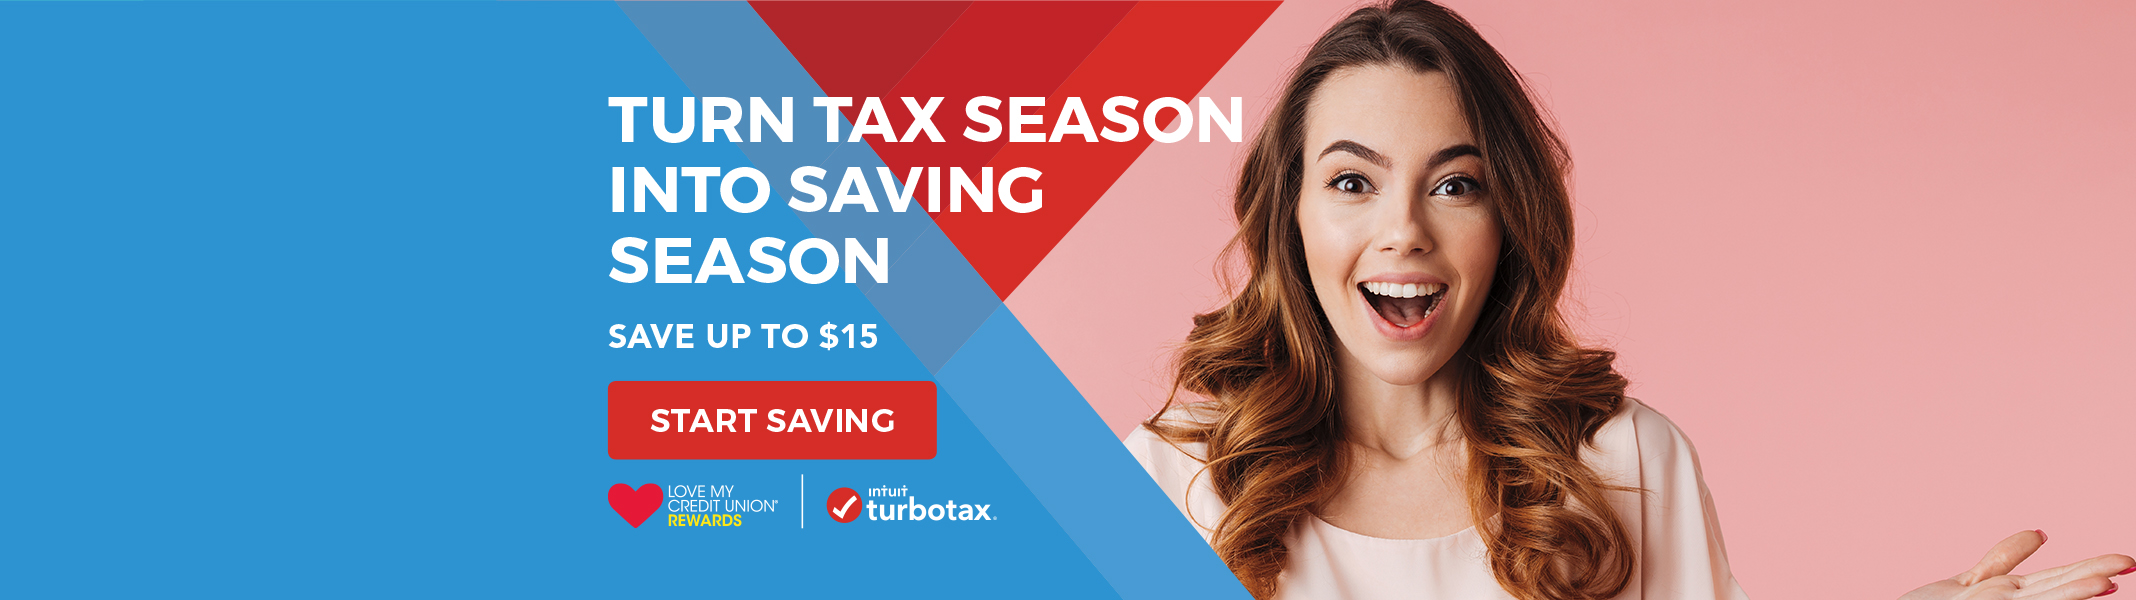 TurboTax 2019